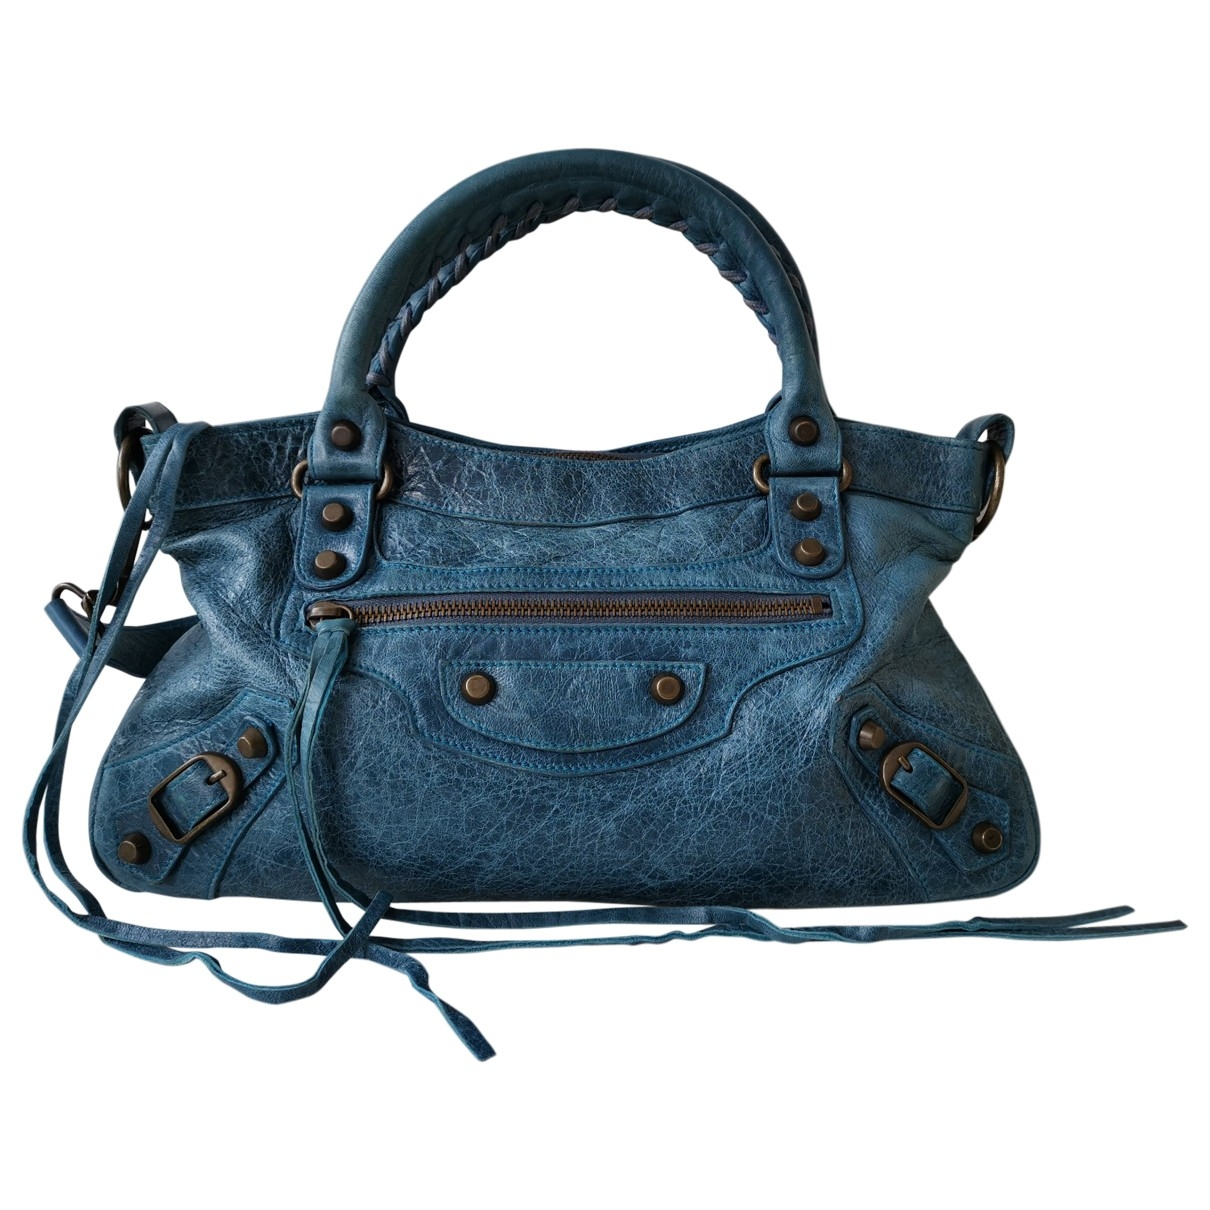 Balenciaga First Handtasche in  Blau Leder